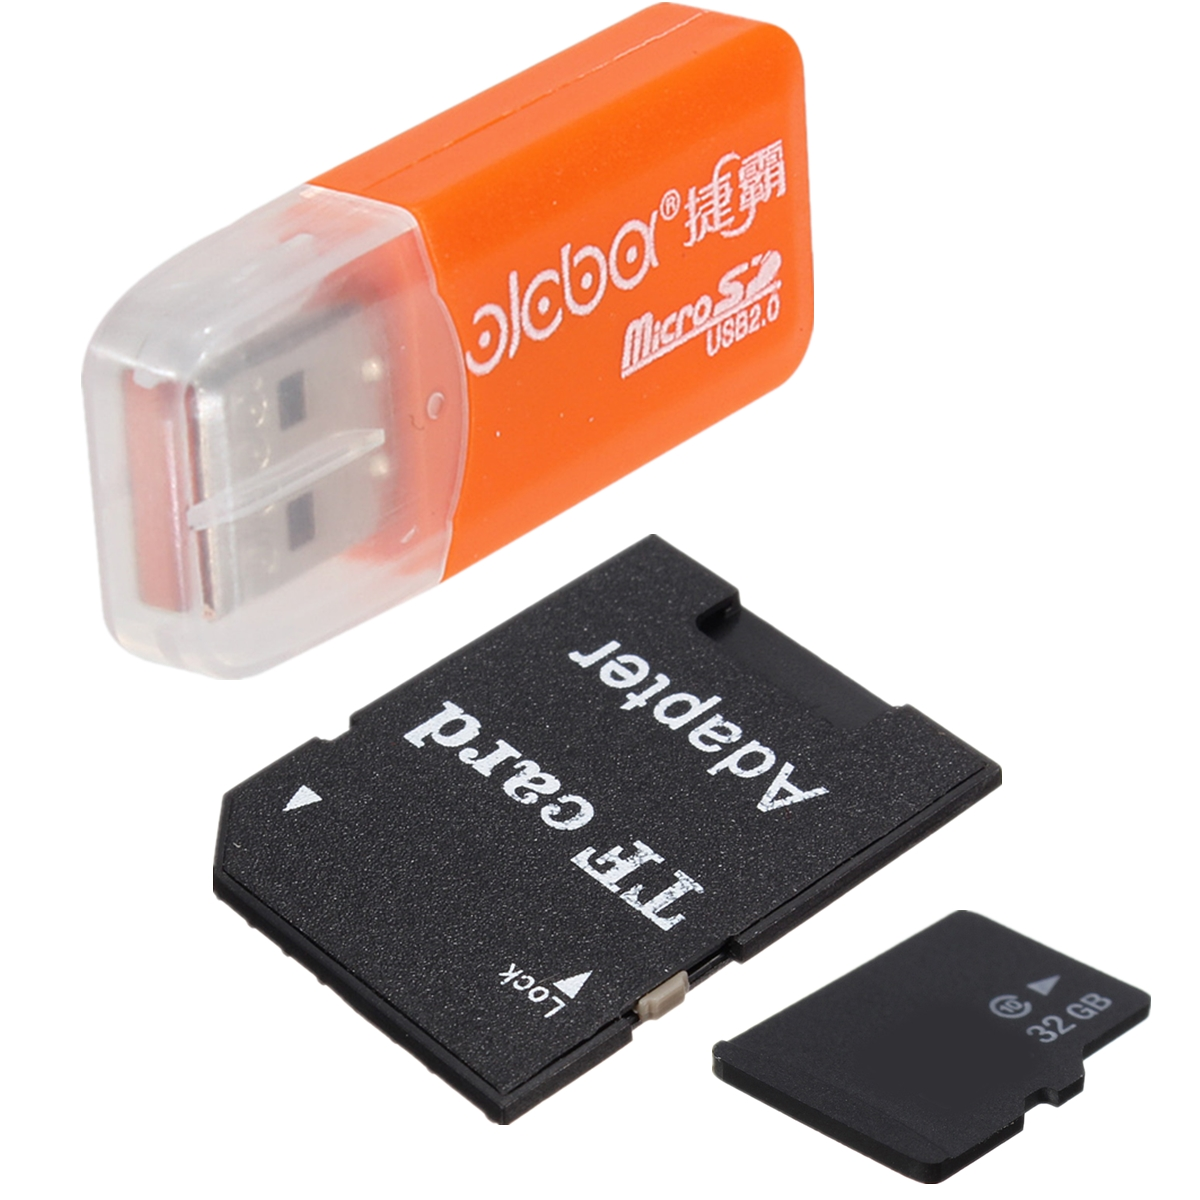 32gb micro sd memoire carte memory card pr nokia lumia 520 625 920 930 1020 730 ebay. Black Bedroom Furniture Sets. Home Design Ideas